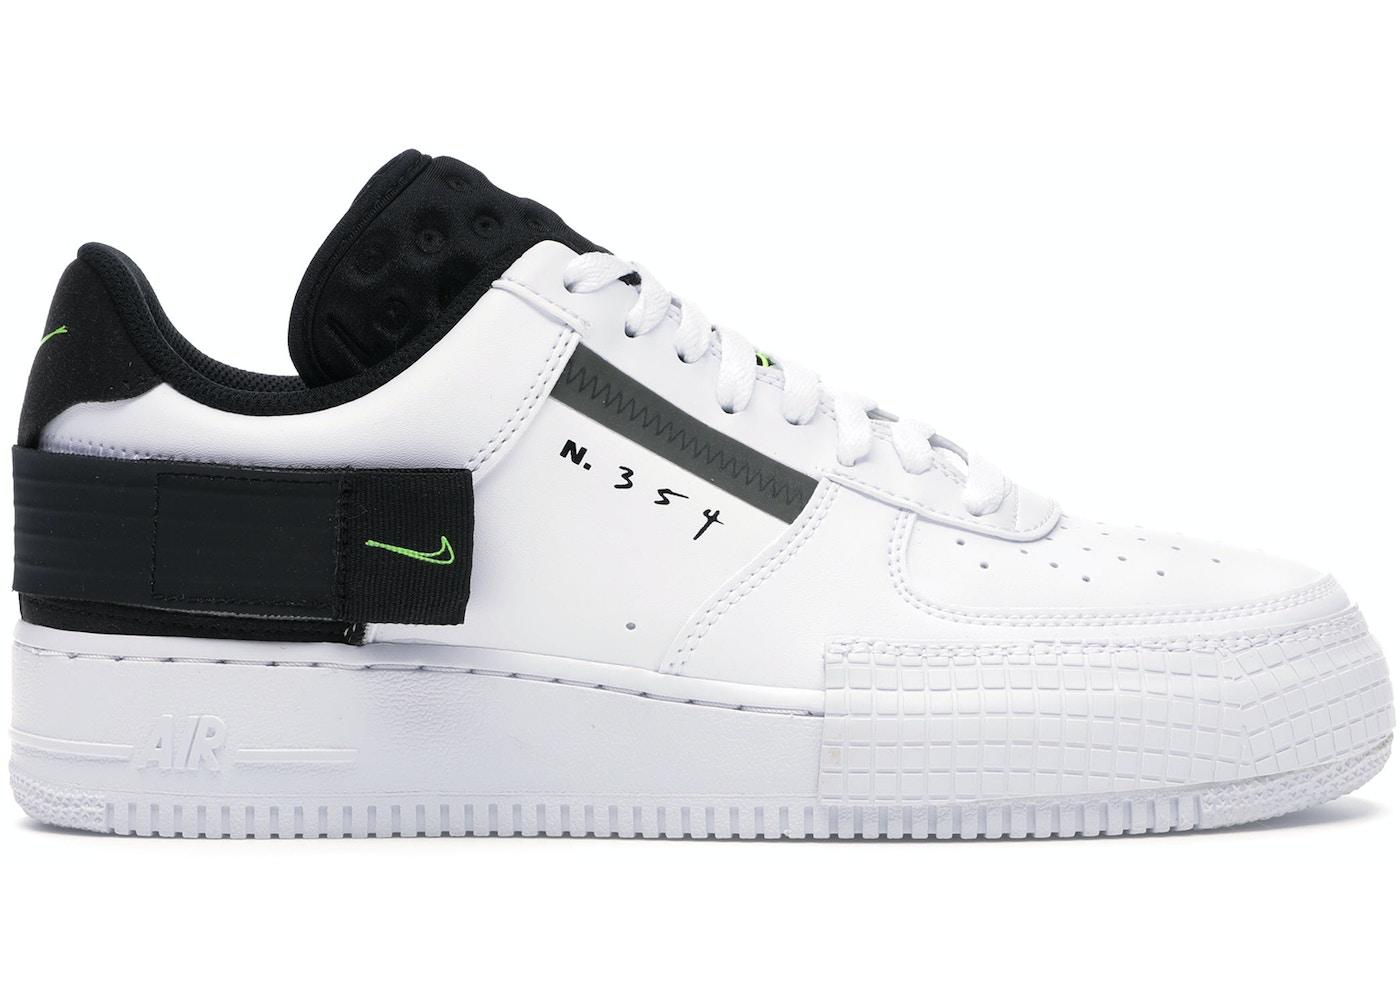 Risa divorcio fin de semana  Nike Air Force 1 Type White Black Volt - AT7859-101